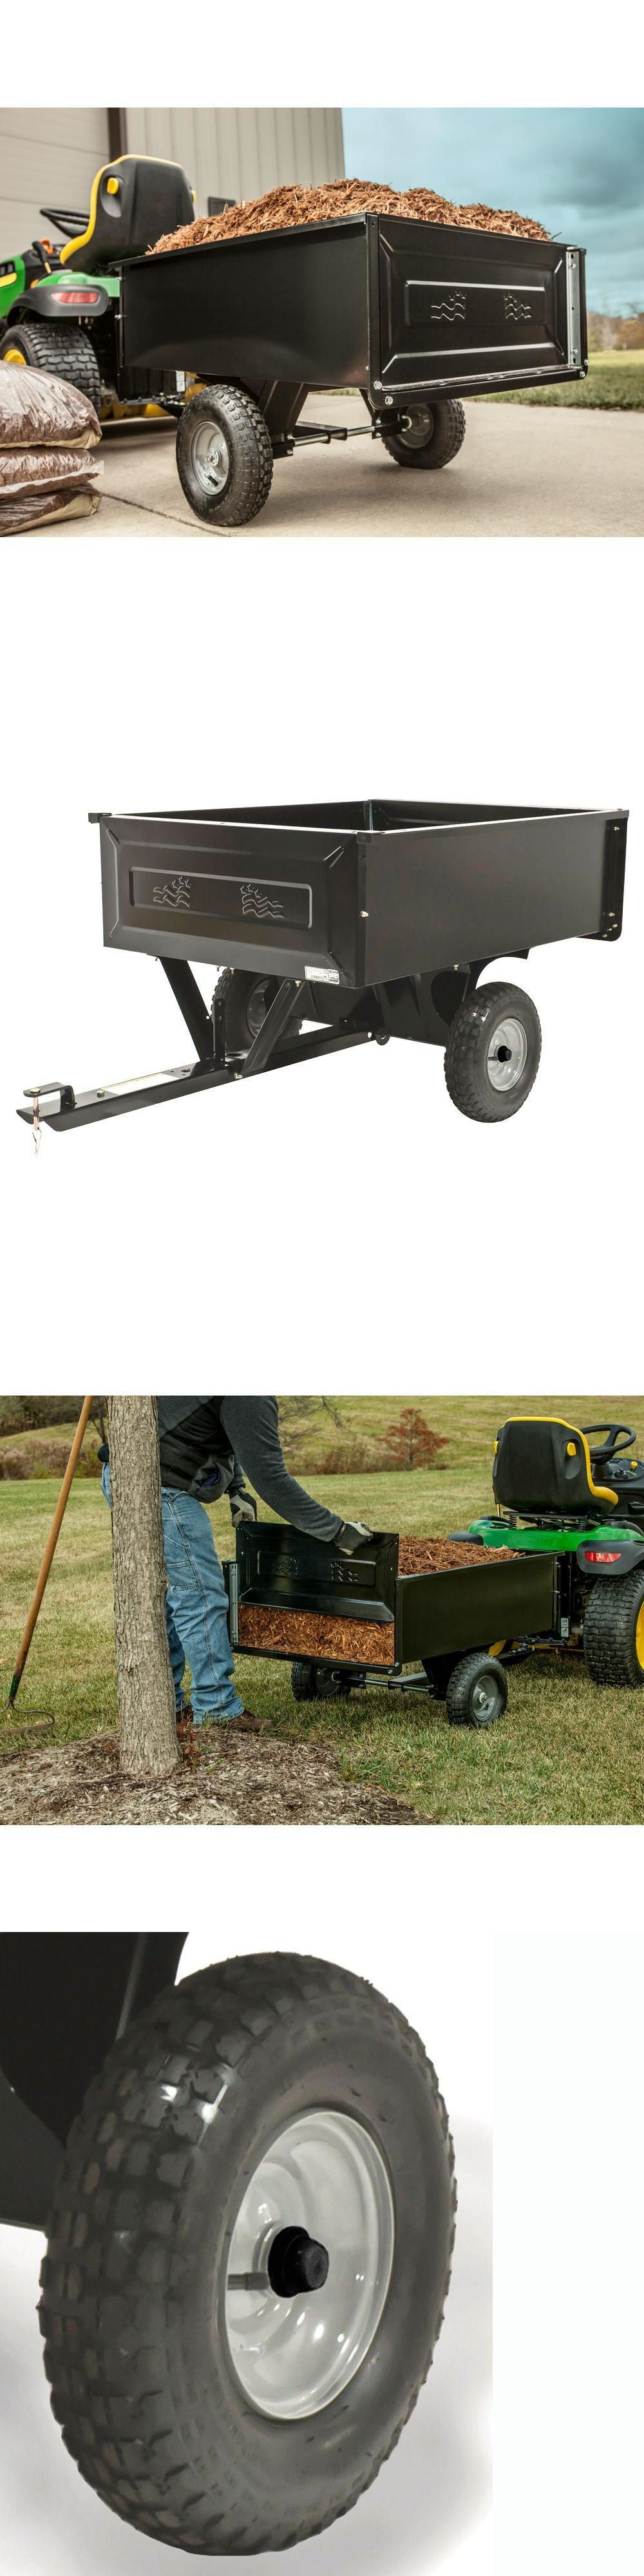 Details About Steel Dump Cart Tractor Mower Atv Garden Wheelbarrow Haul Agri Fab Yard Trailer Tractor Mower Dump Cart Lawn Mower Tractor